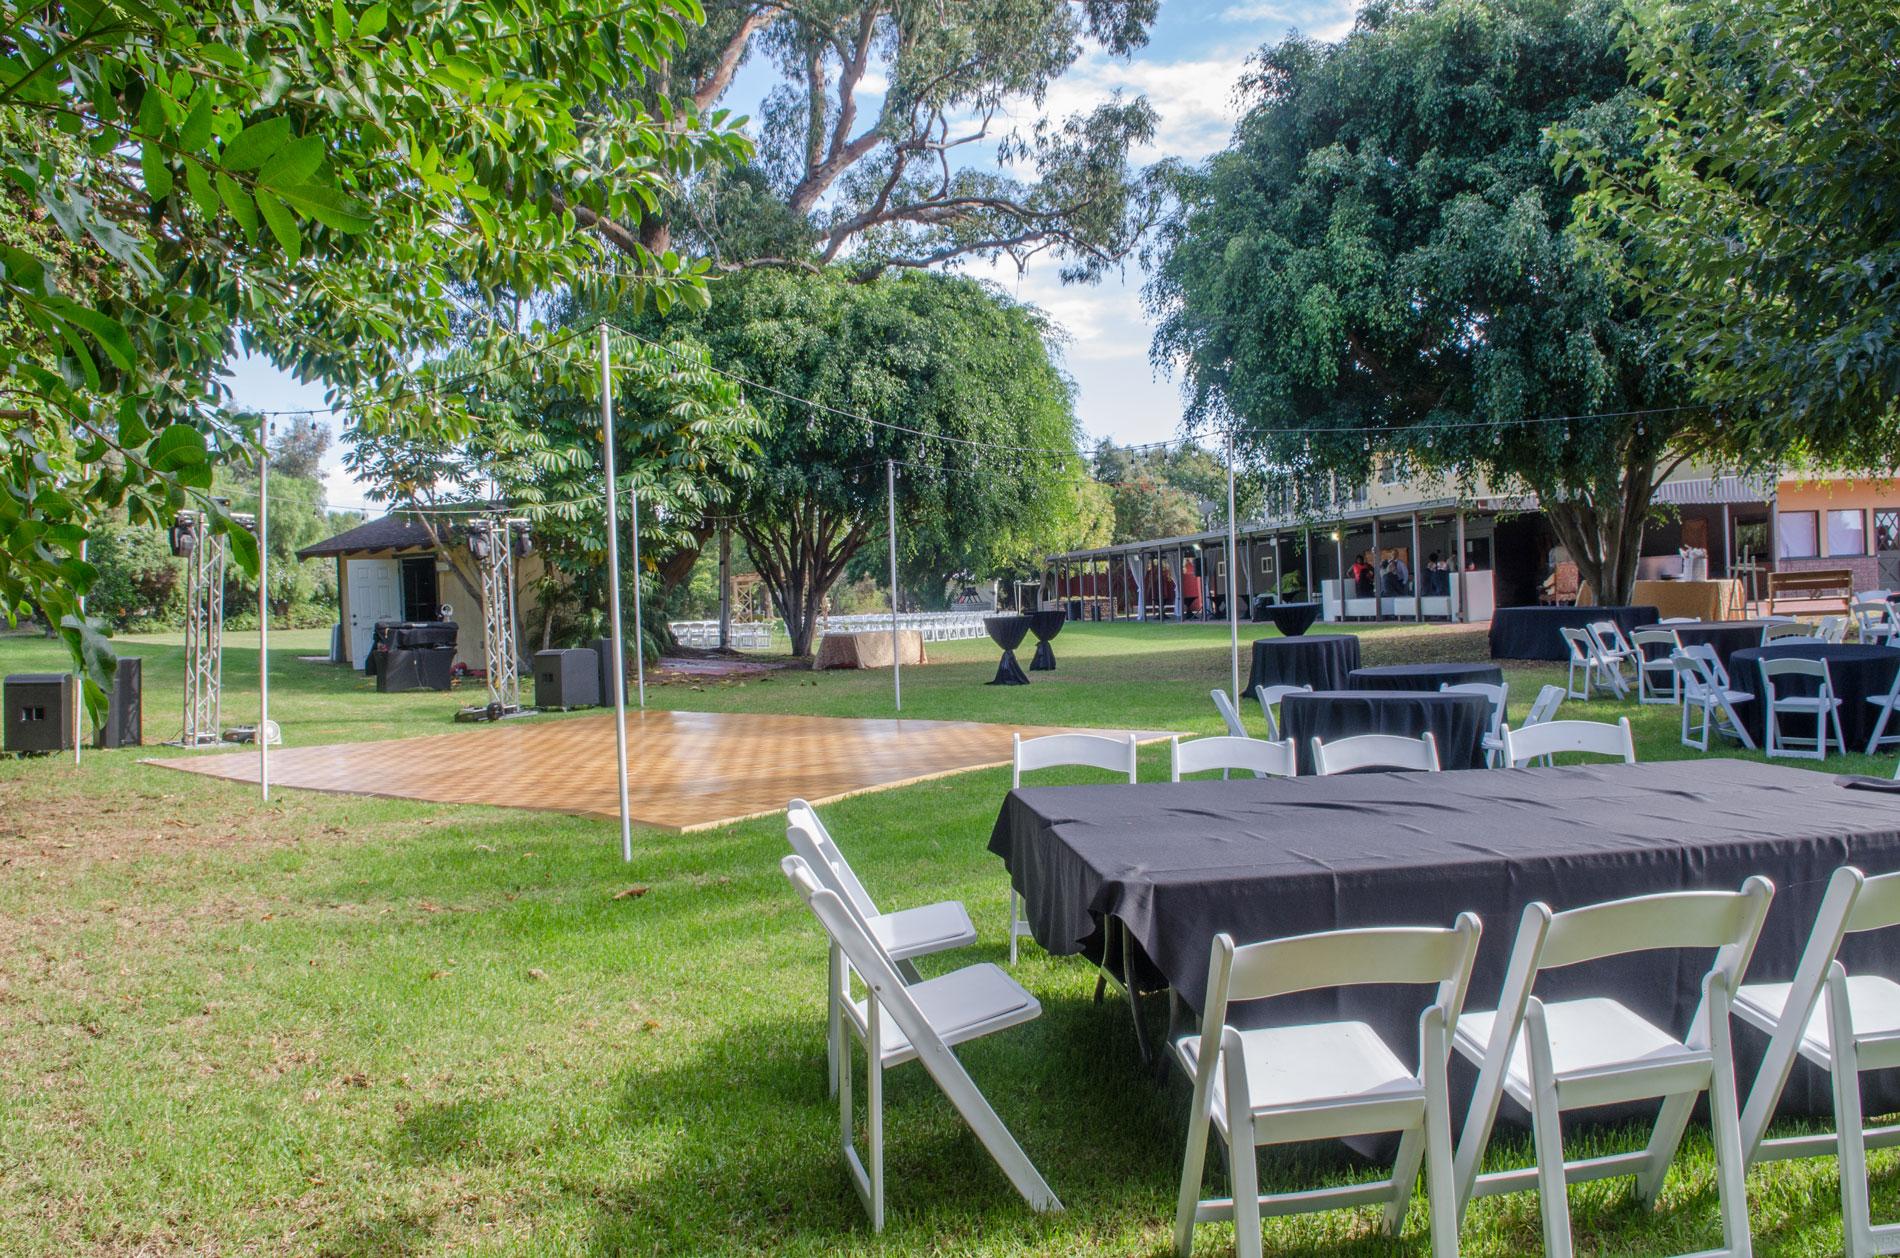 Swiss Park Event Center Gallery In San Diego Chula Vista